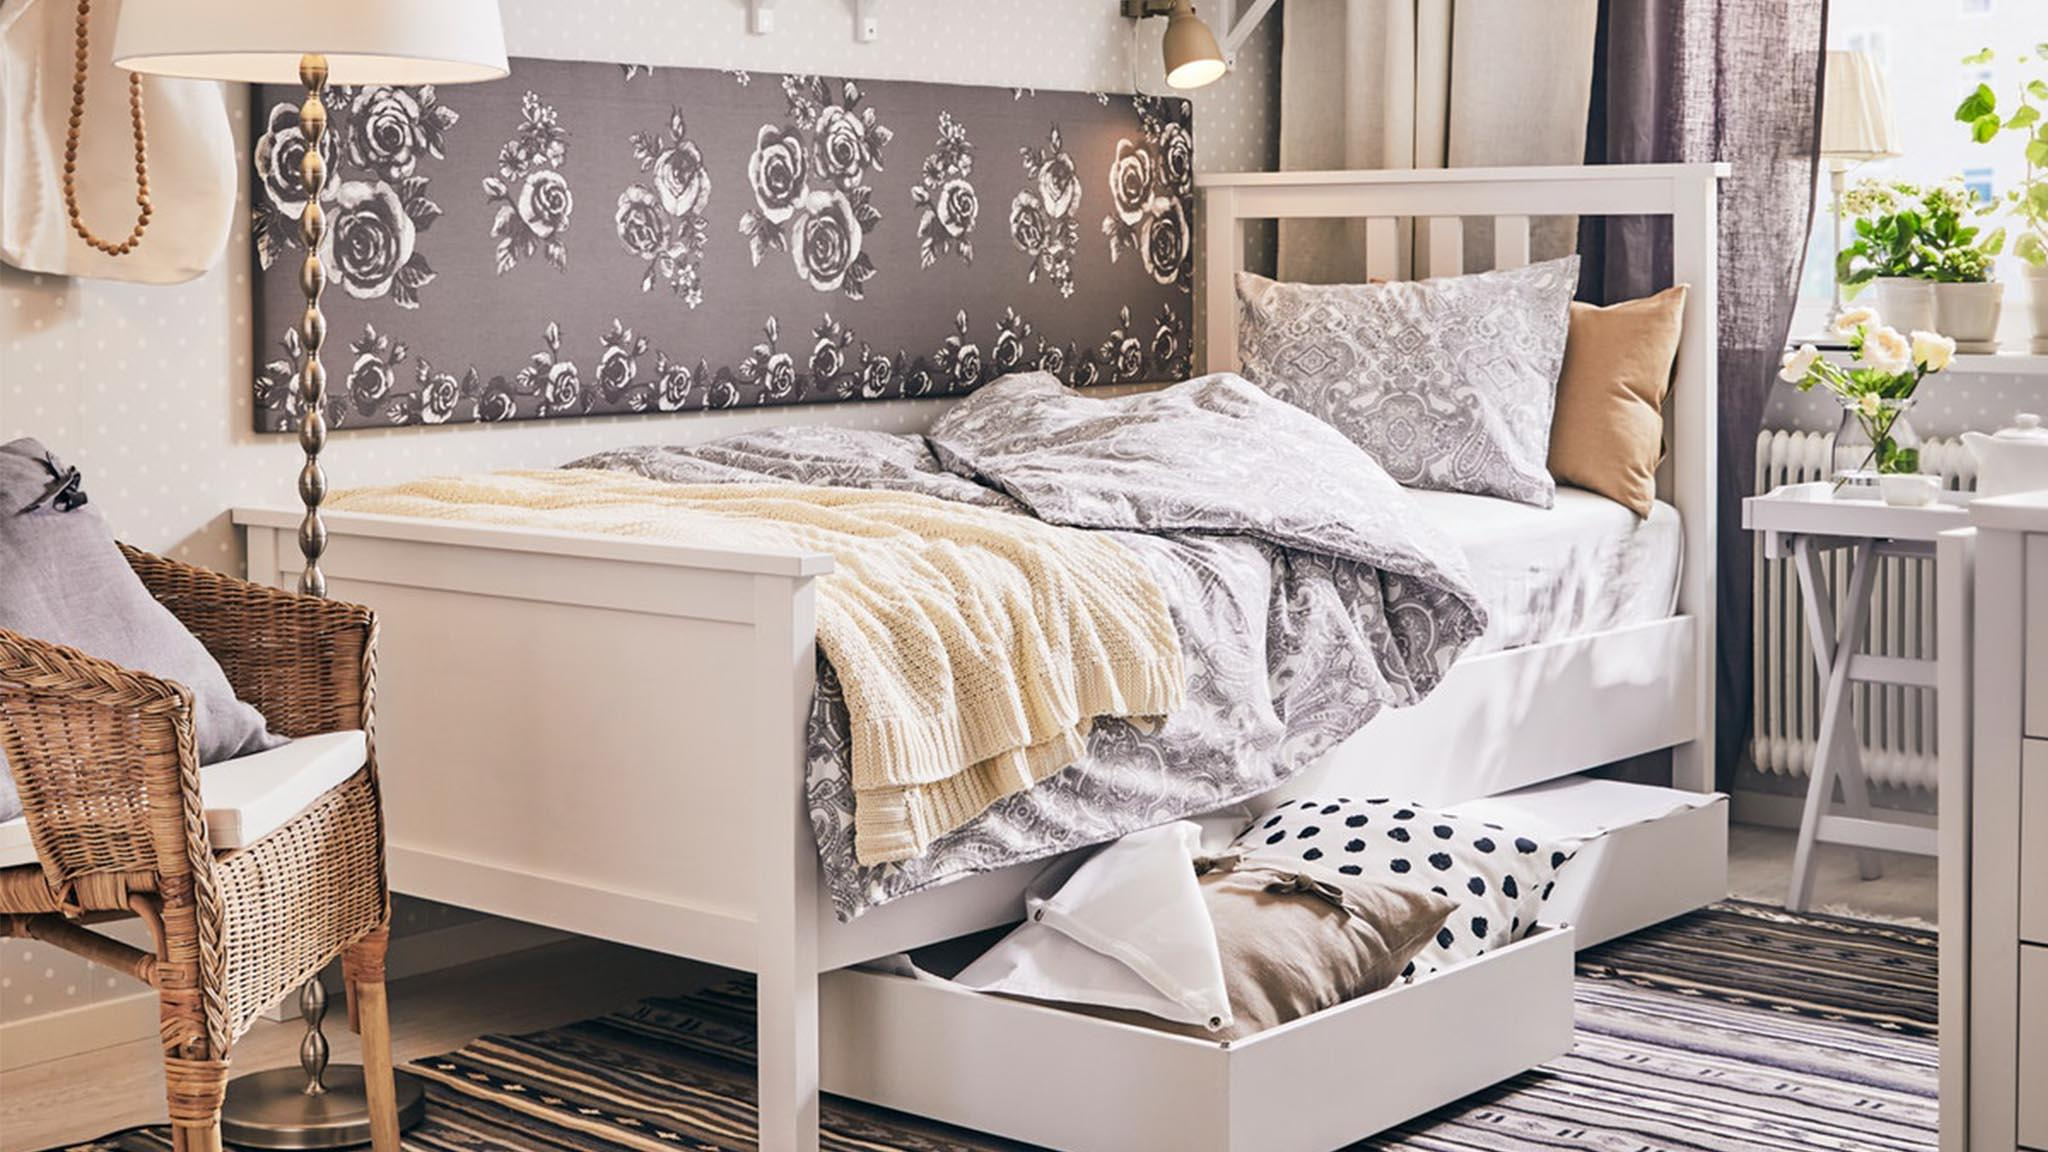 Ypperlig Soverom - IKEA XO-29